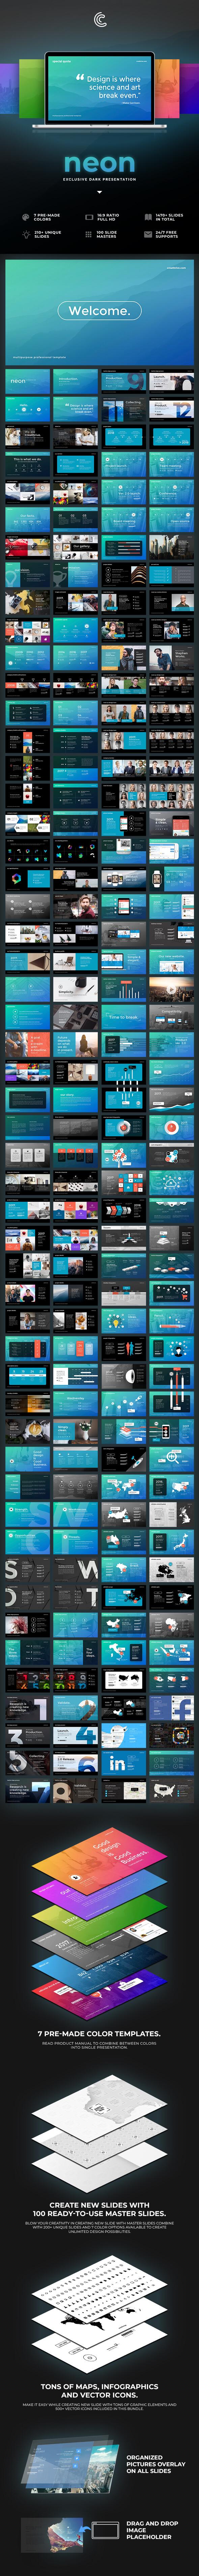 Neon PowerPoint - PowerPoint Templates Presentation Templates